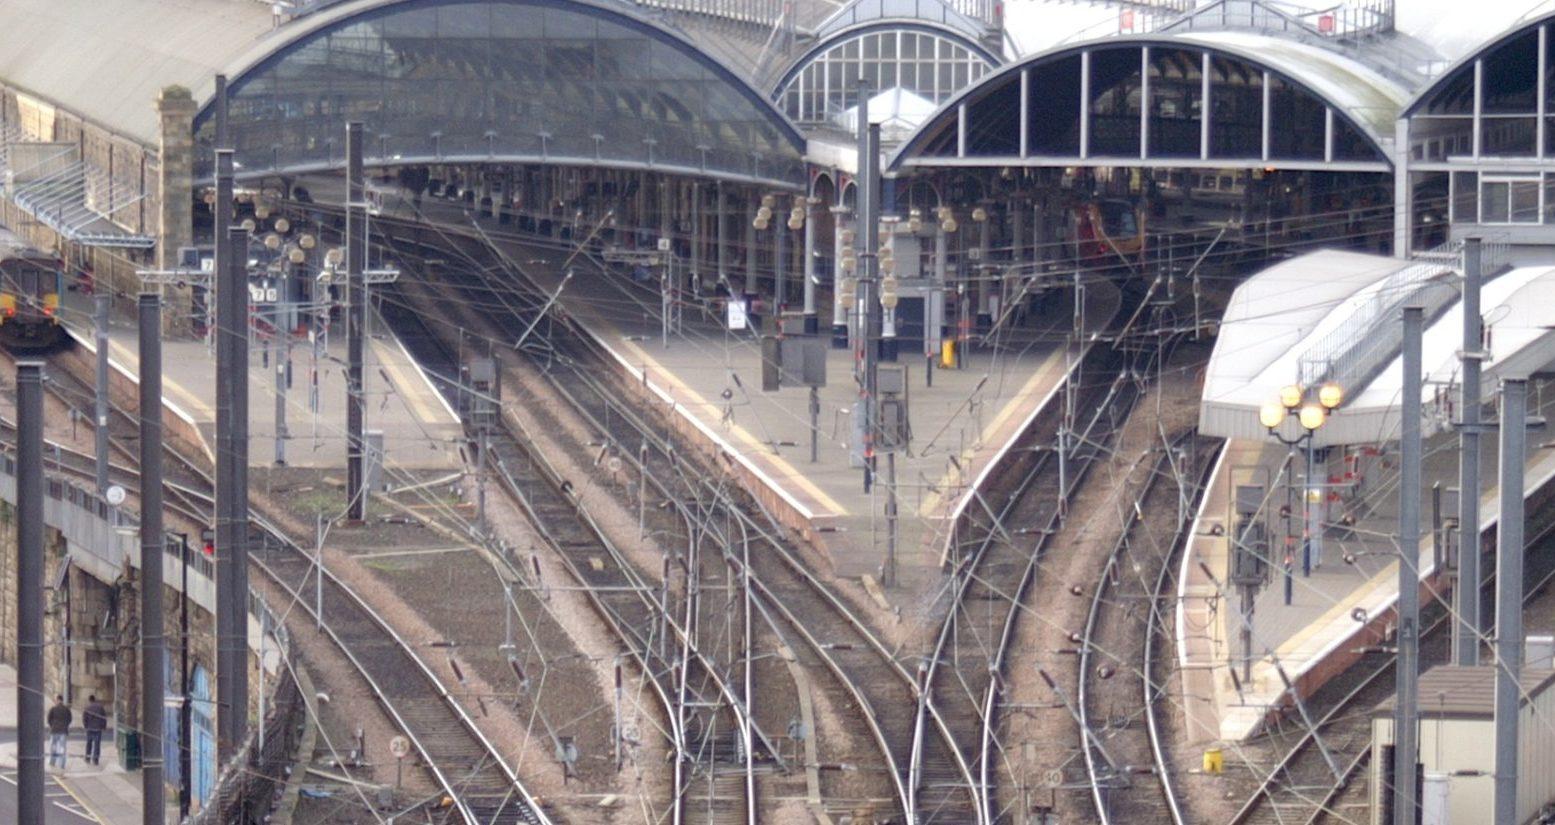 Newcastle Railway Station.